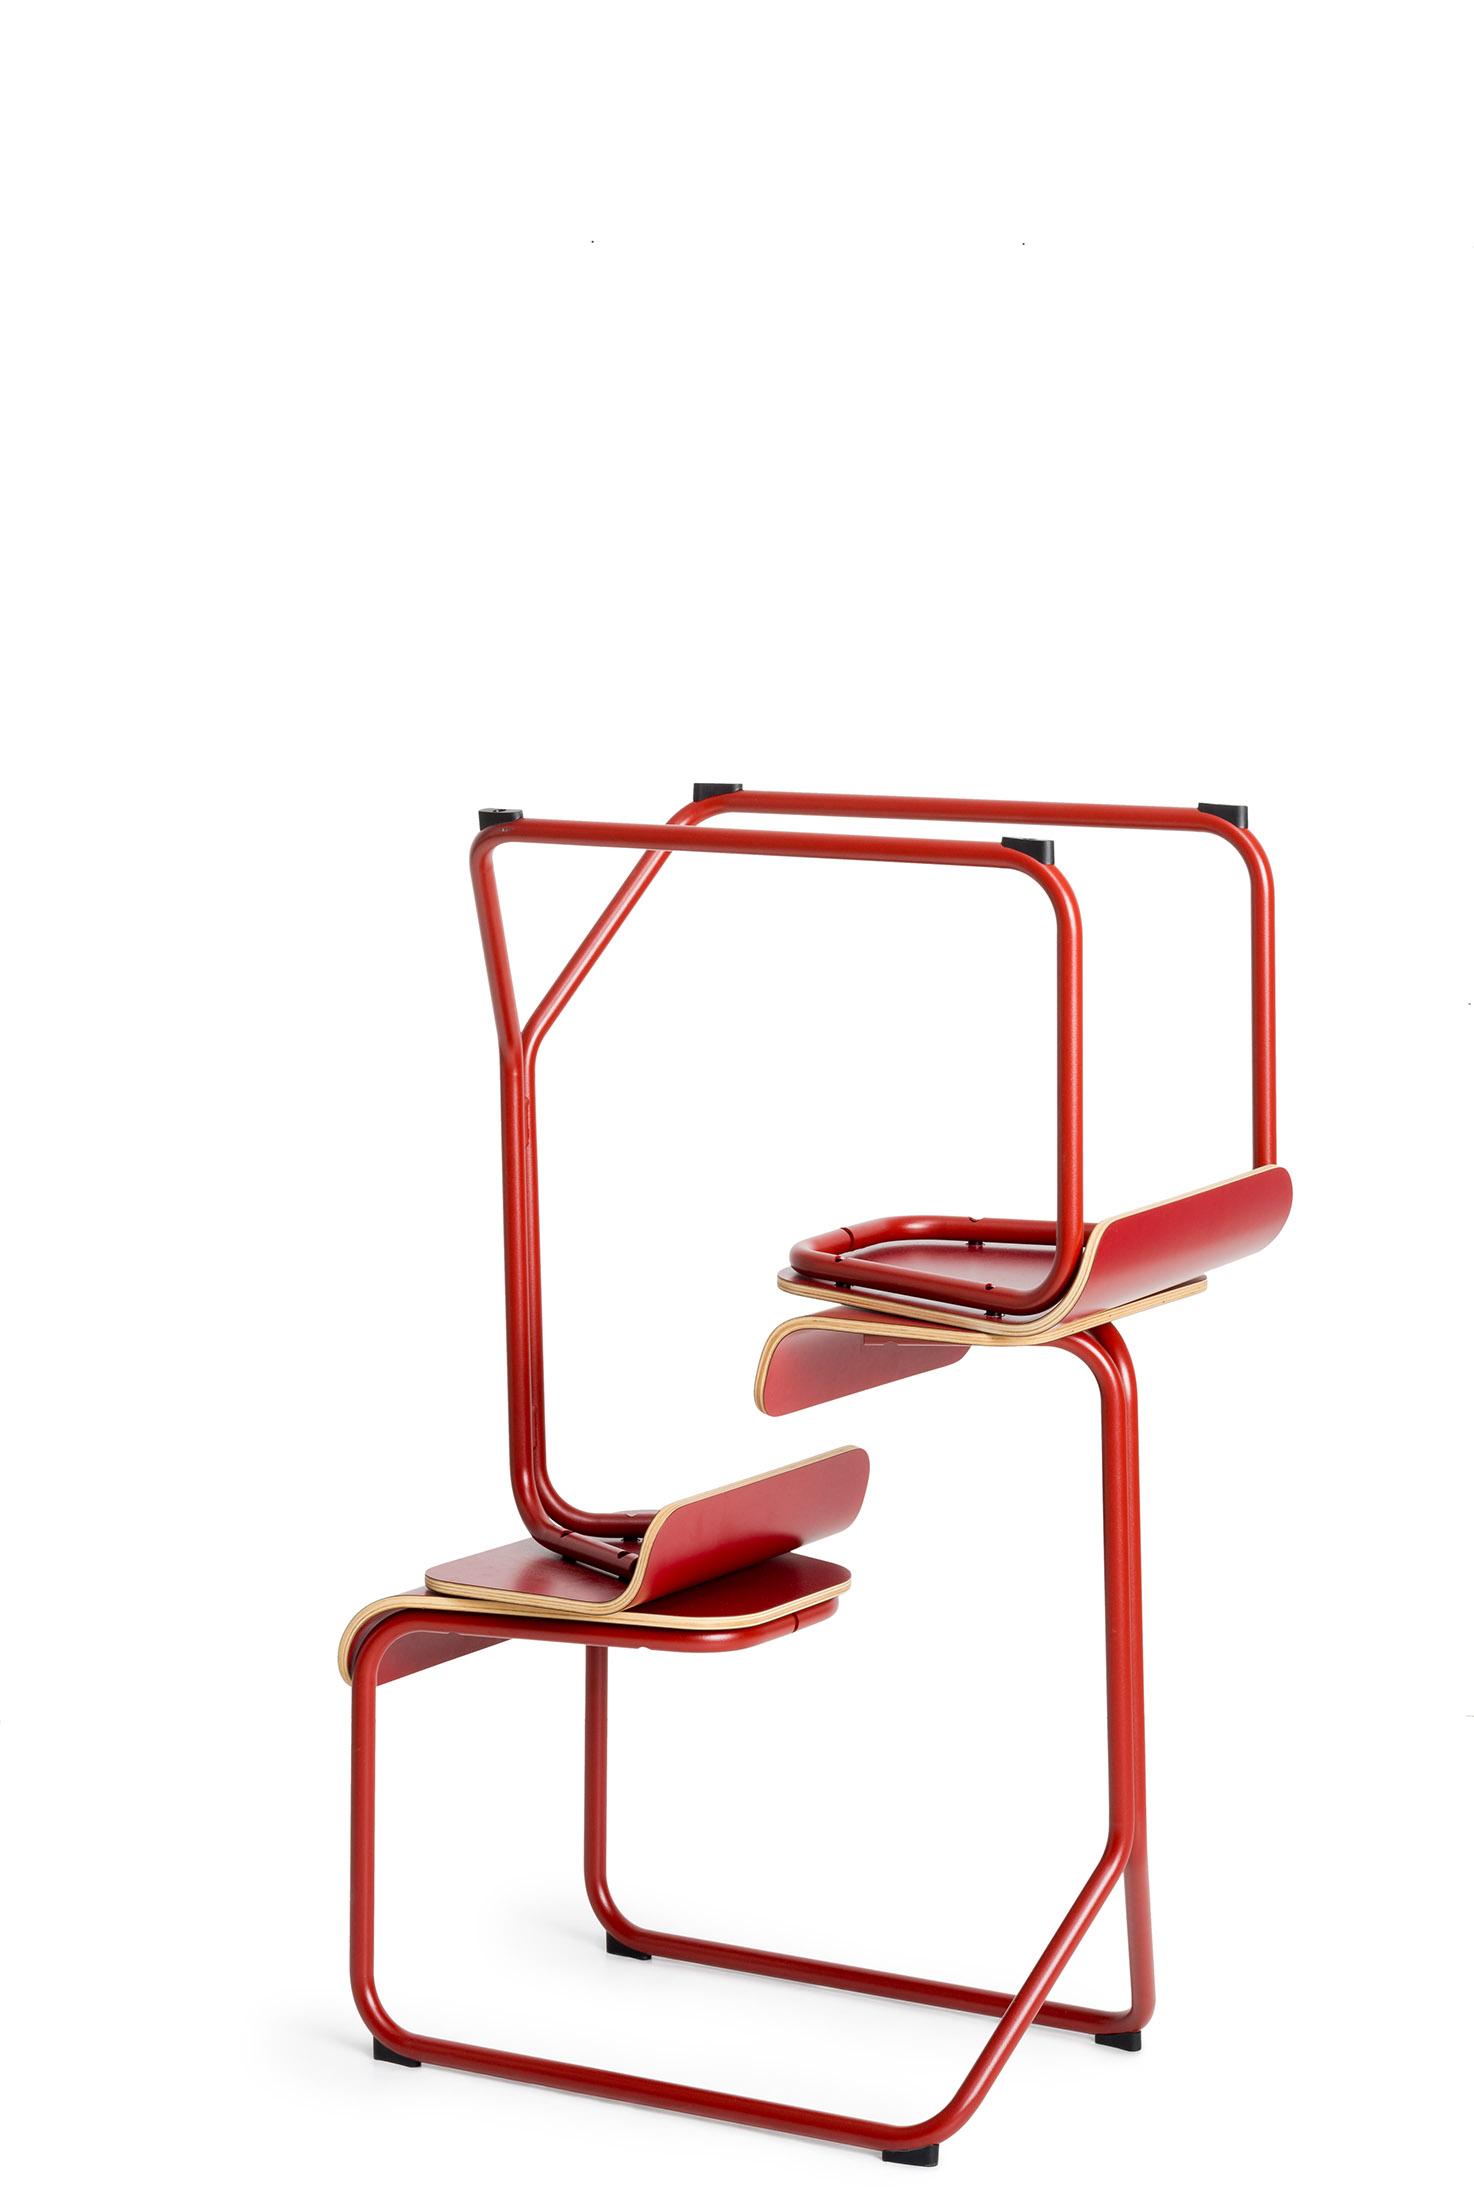 toboggan-chair-red-stacked_l,0.jpg